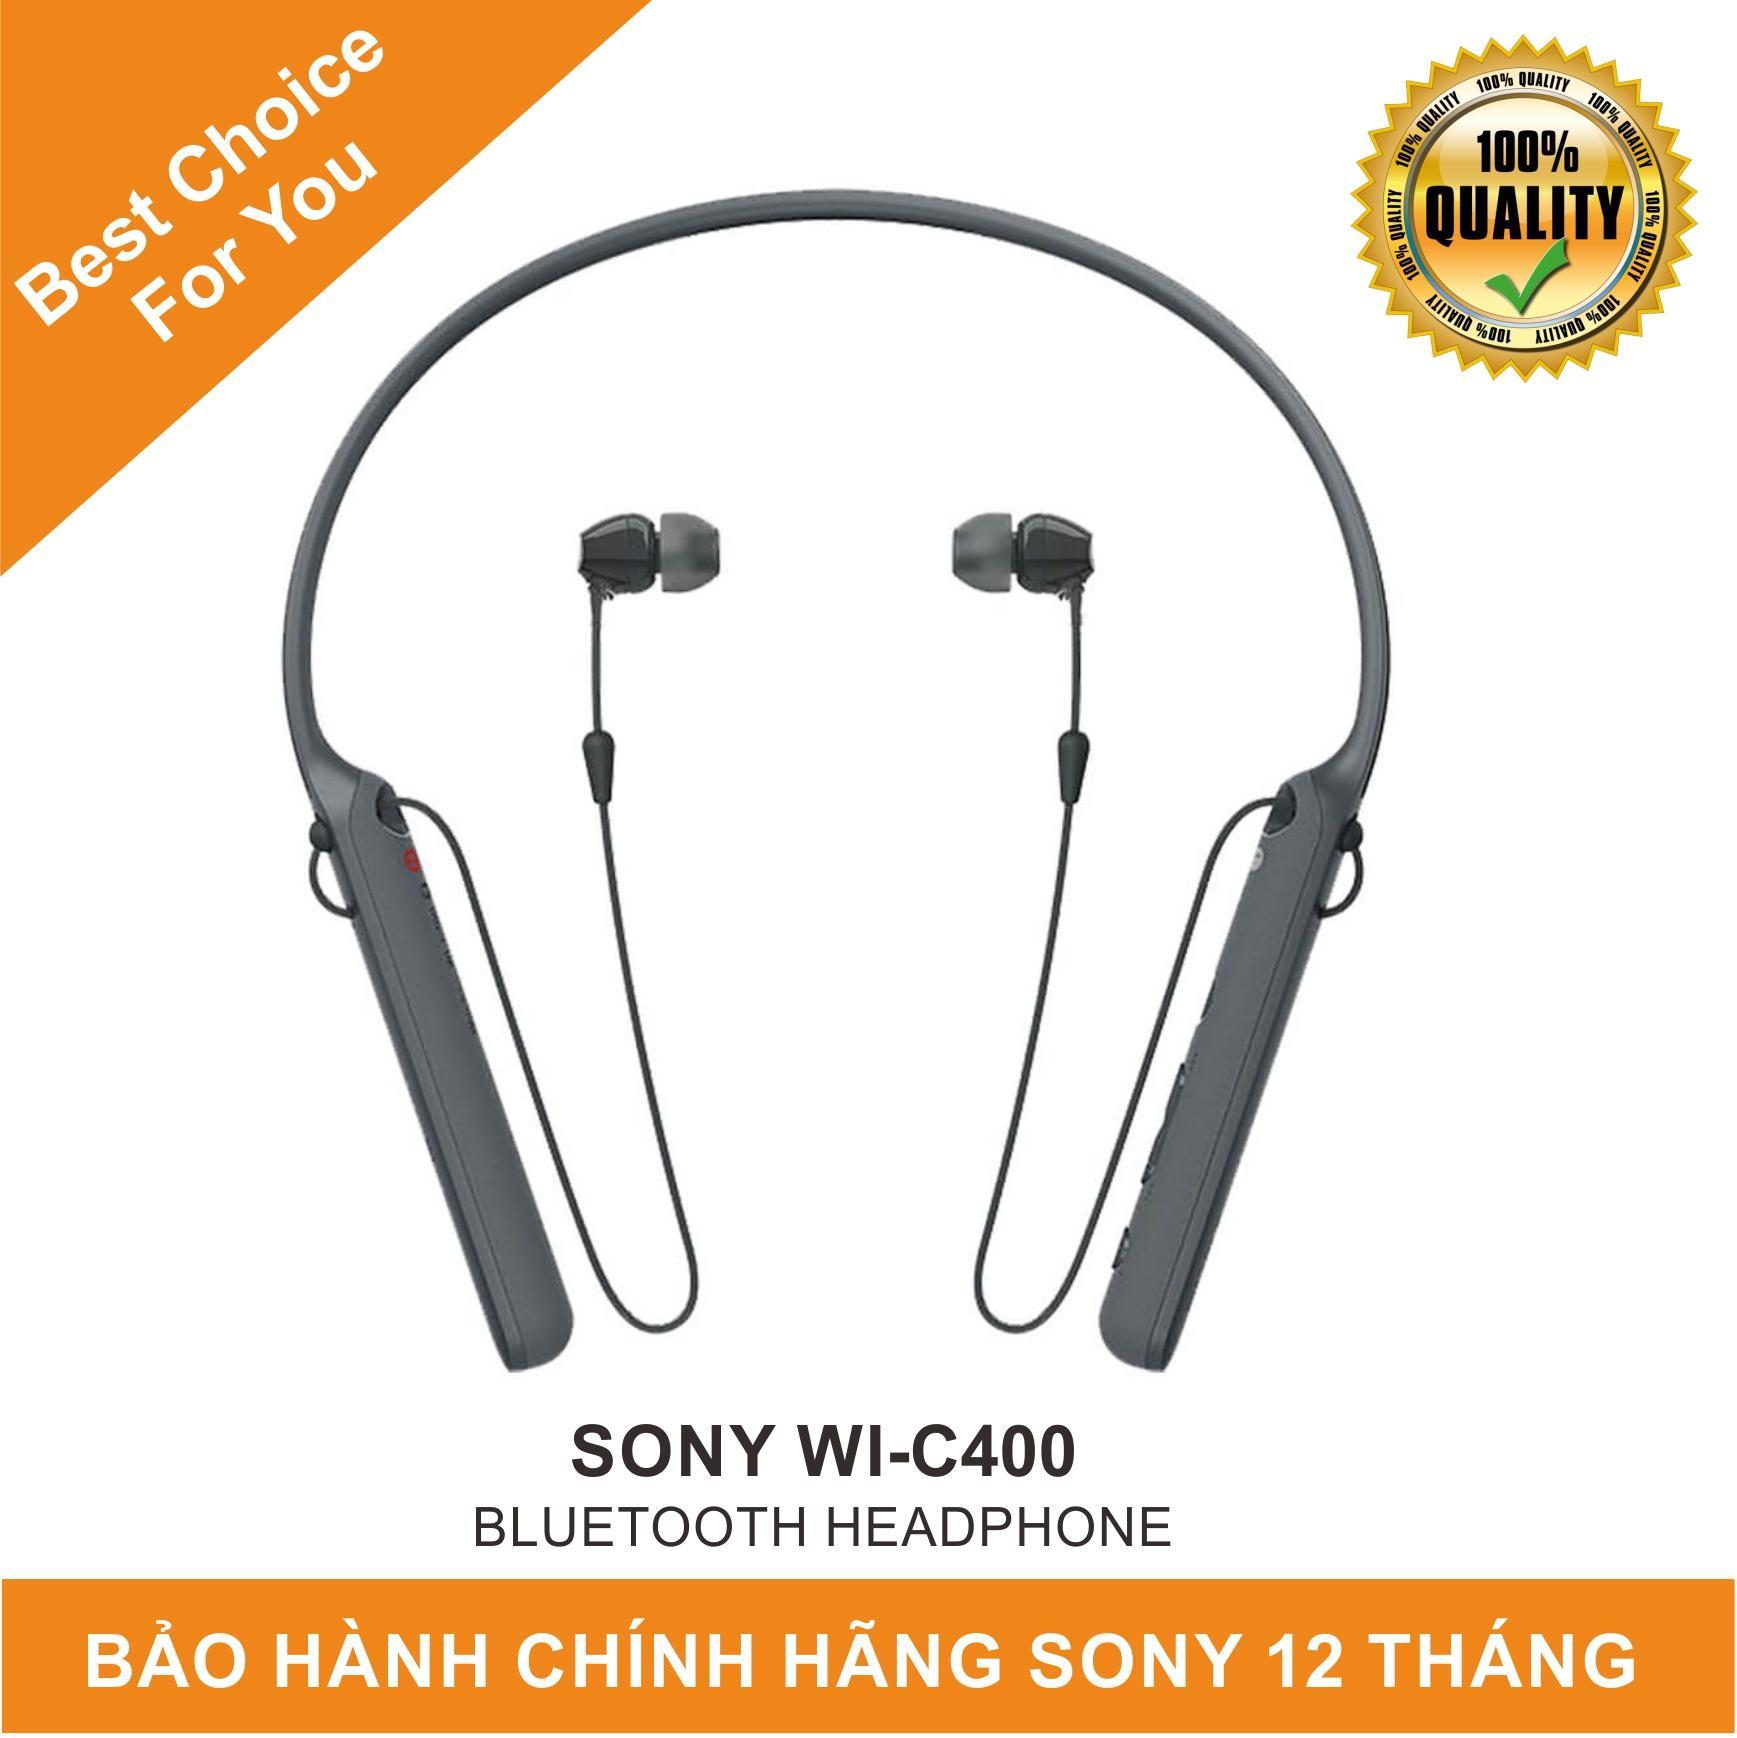 Giá Bán Tai Nghe Sony In Ear Khong Day Wi C400 Sony Trực Tuyến